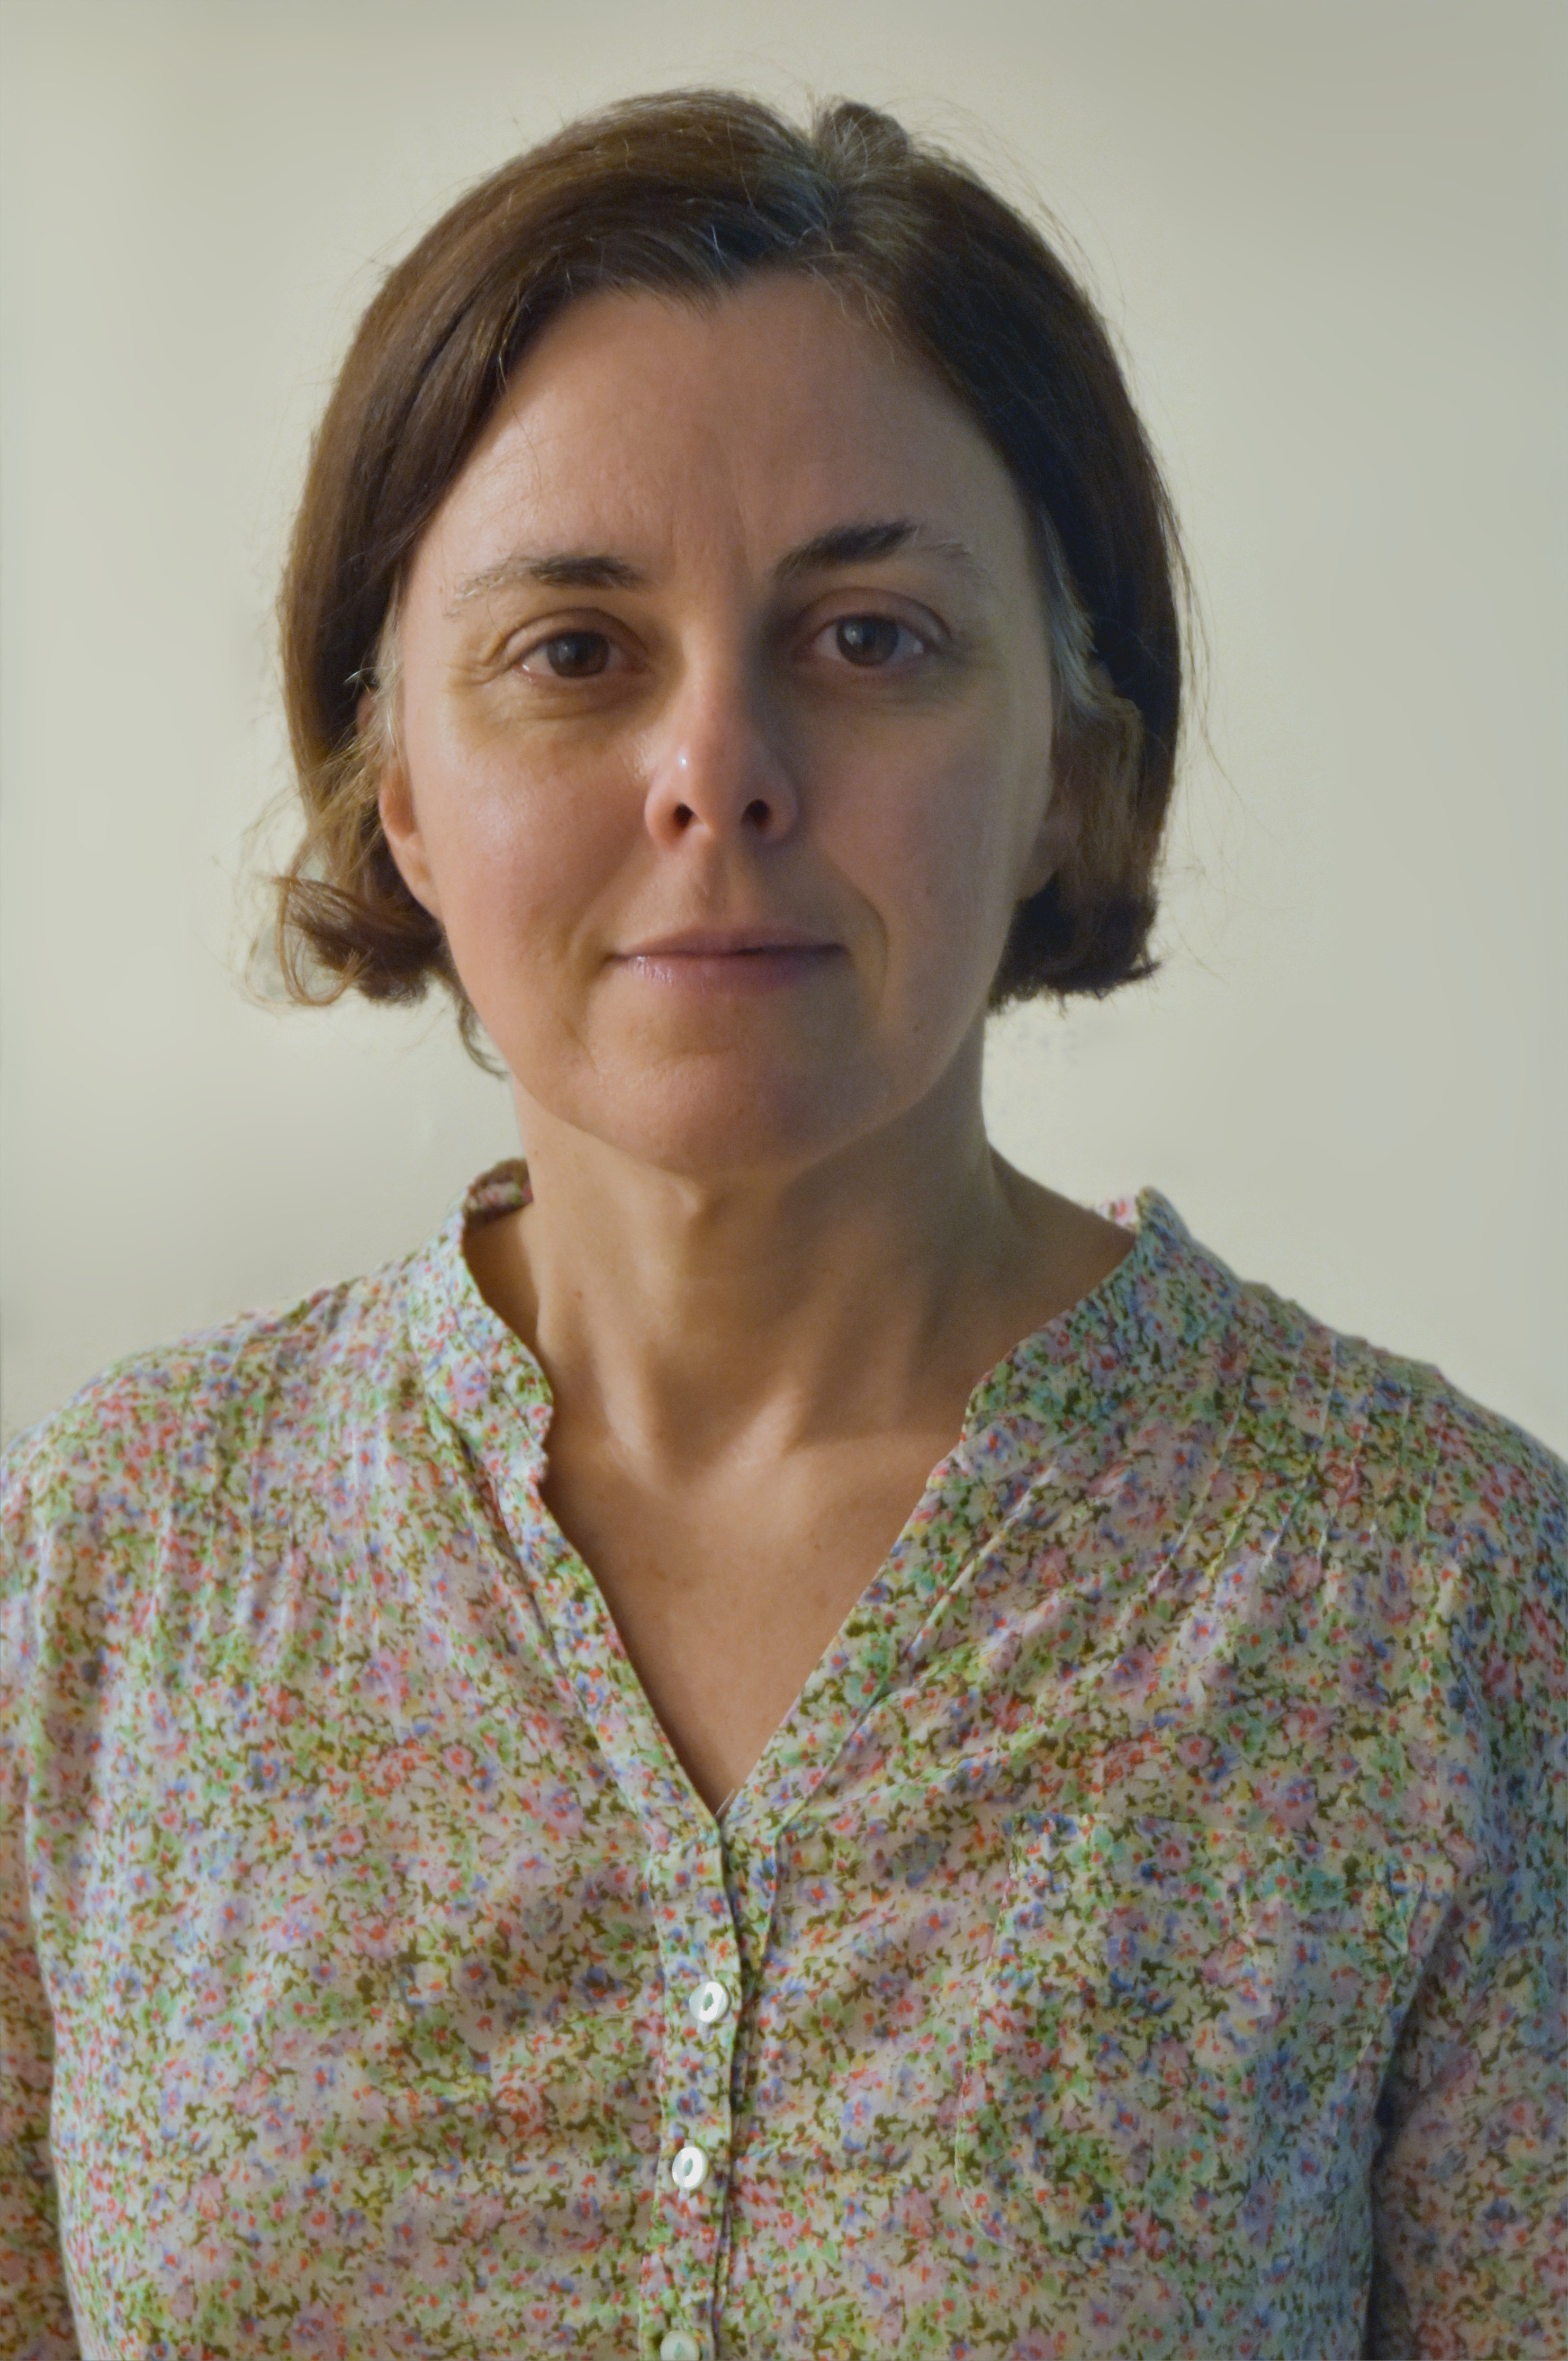 Paola Formenti